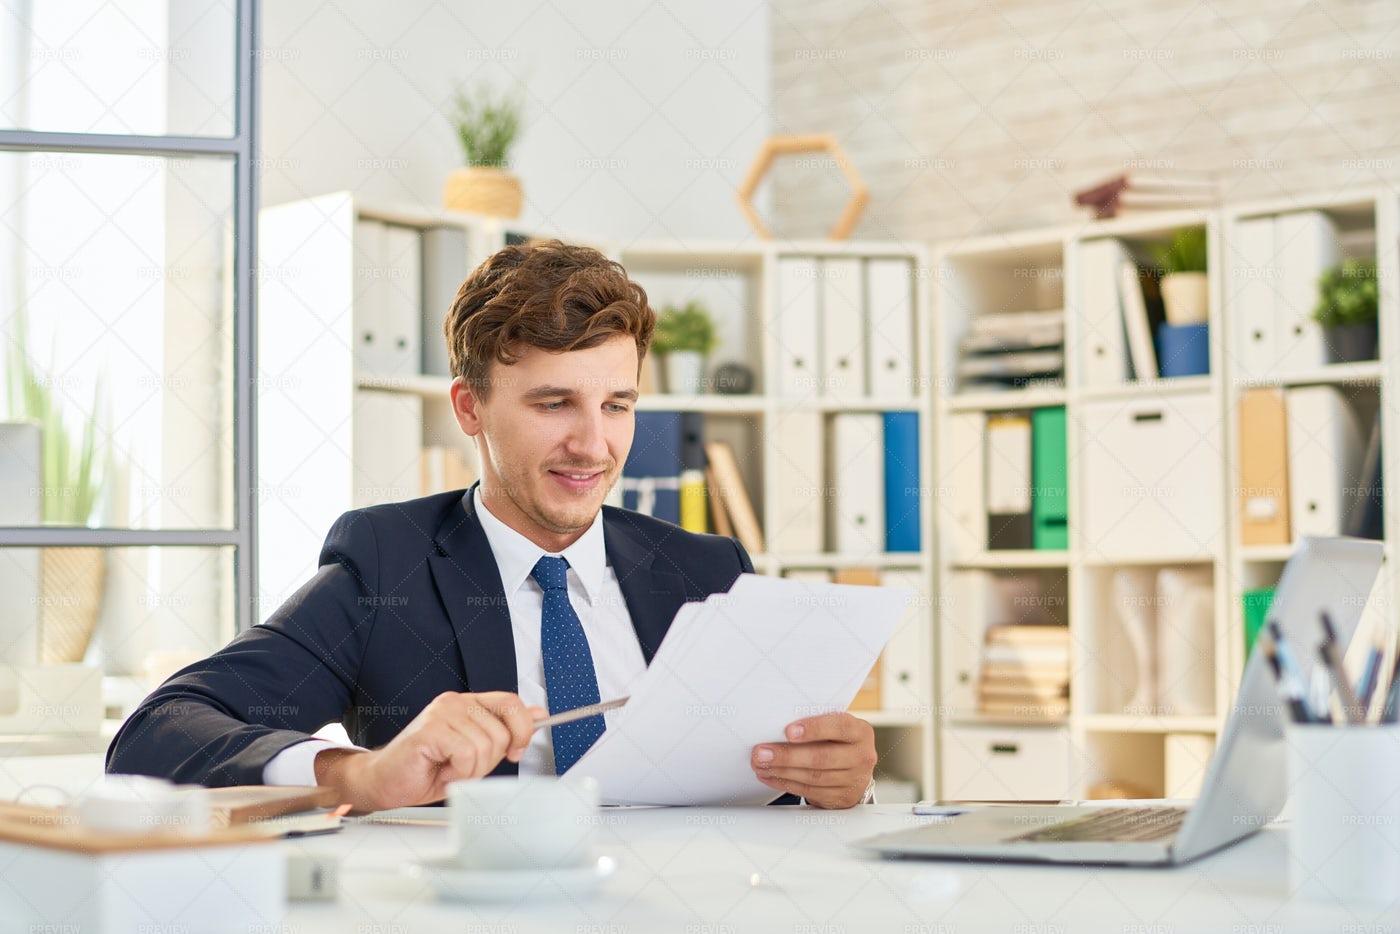 Successful Businessman Reading...: Stock Photos